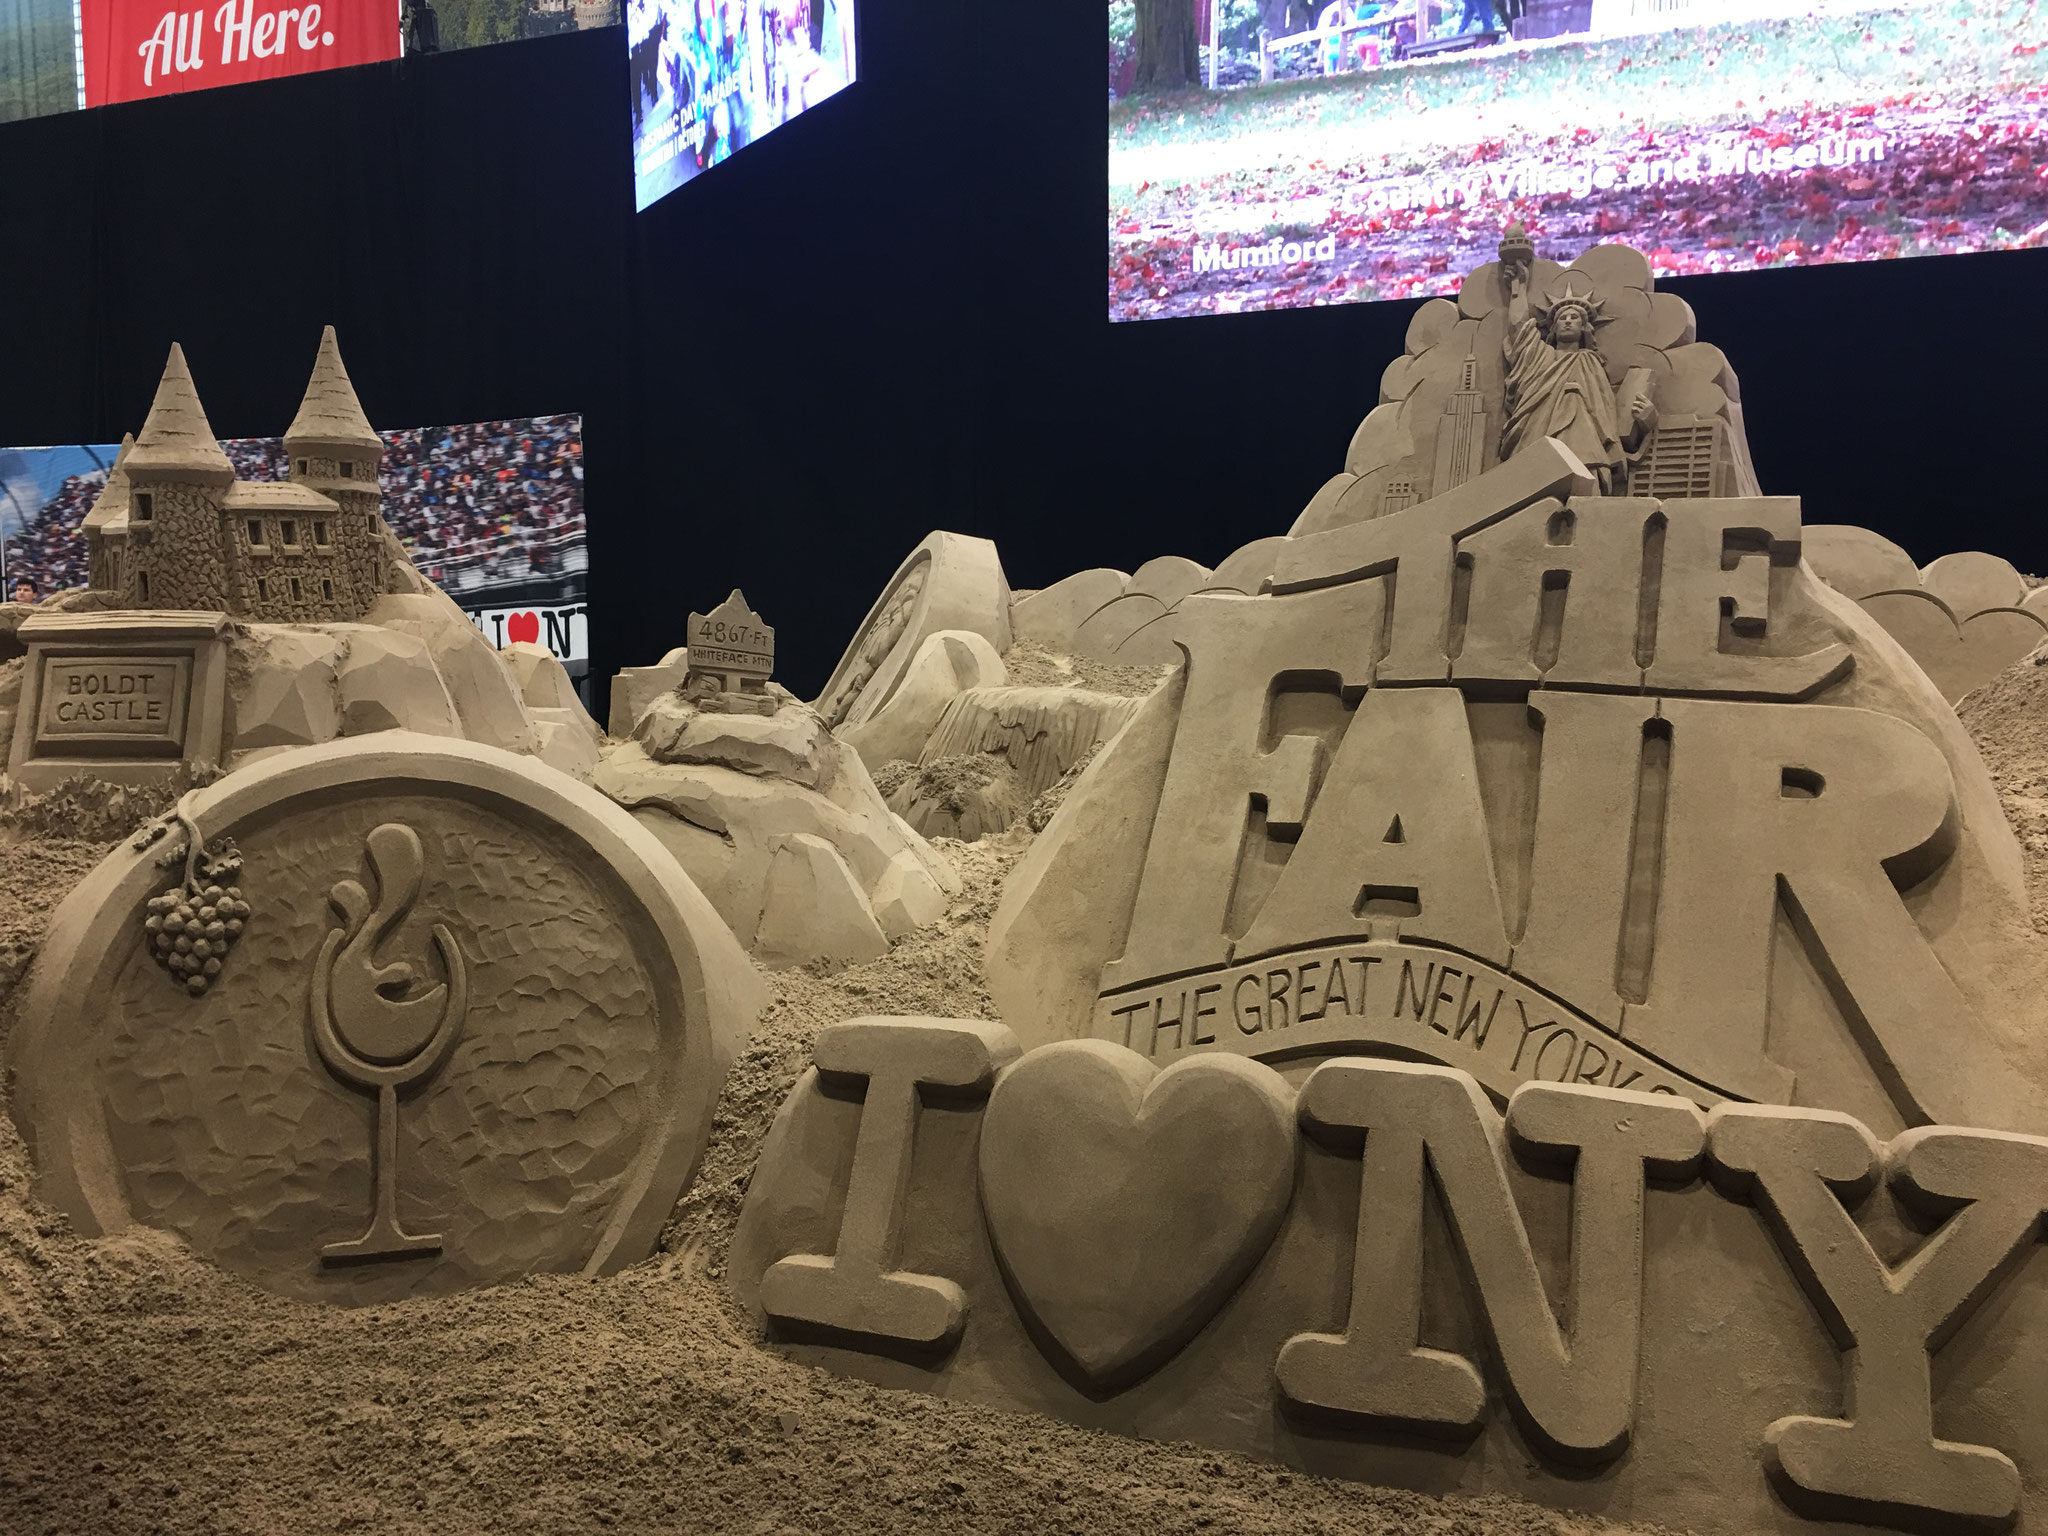 the Sand Sculpture